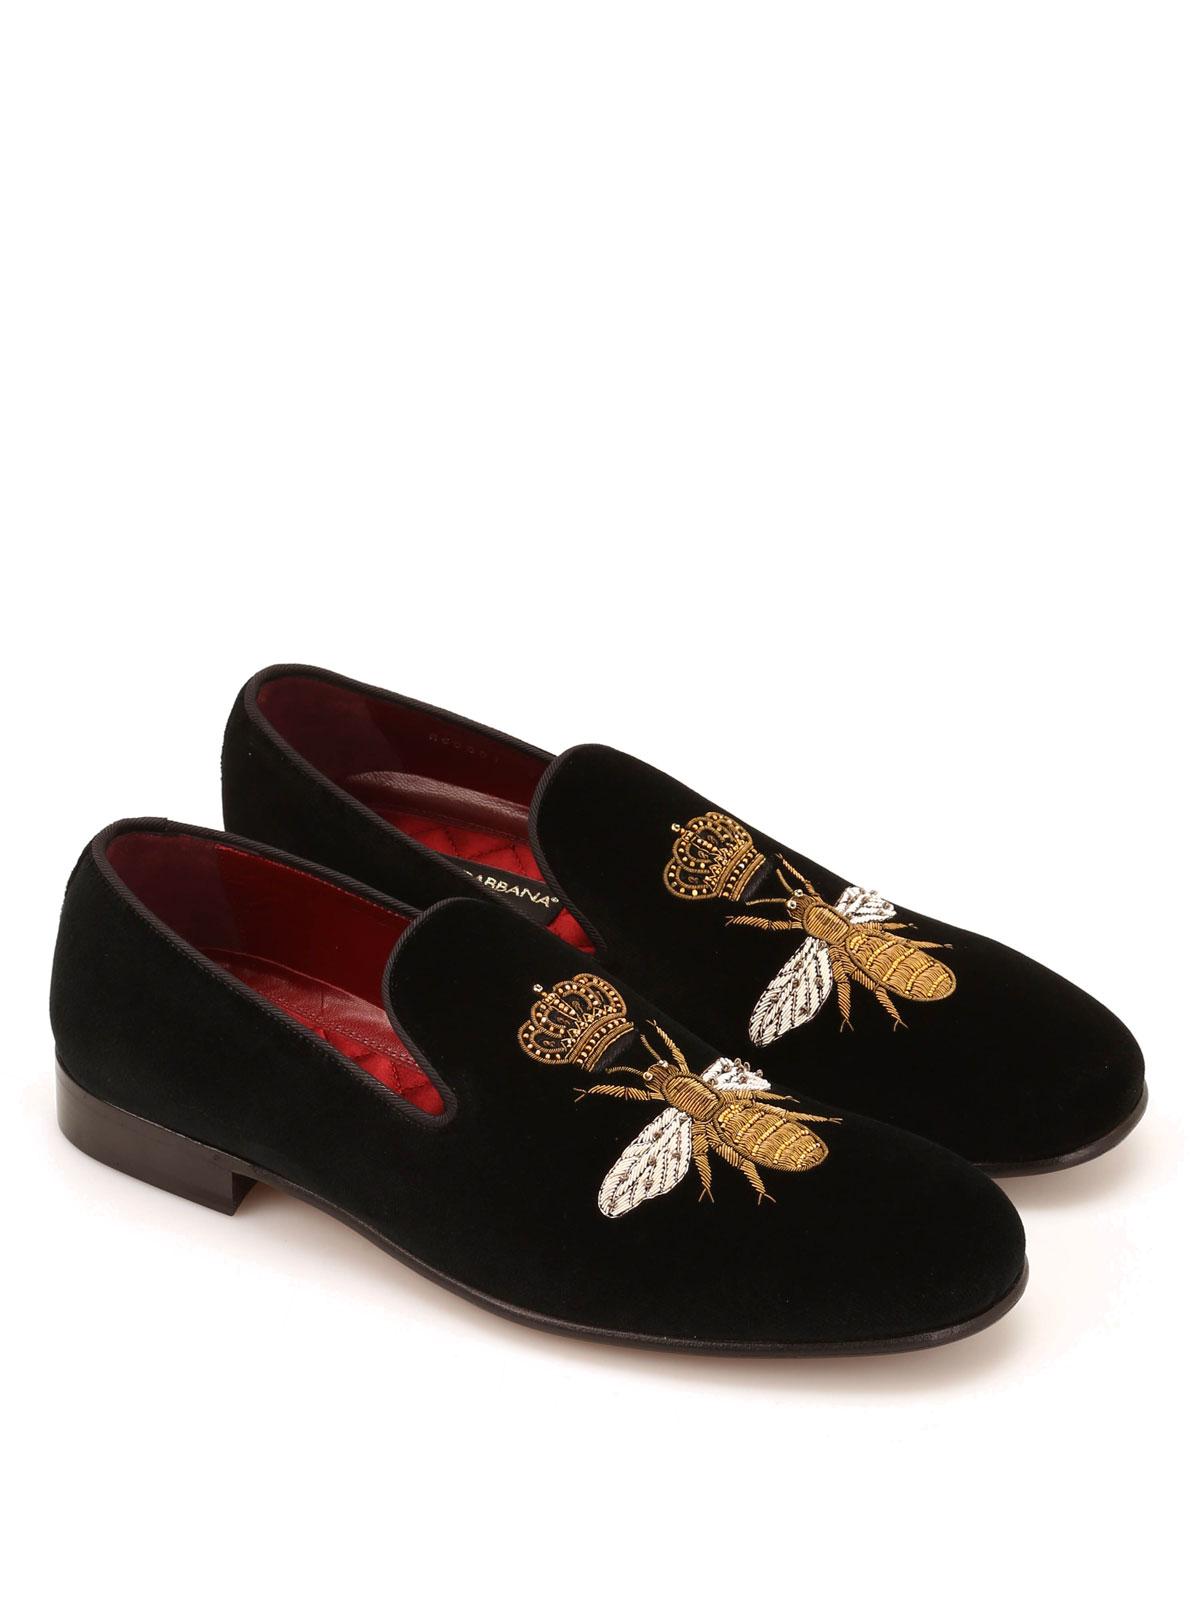 Dolce & Gabbana Milano loafers Elgoy